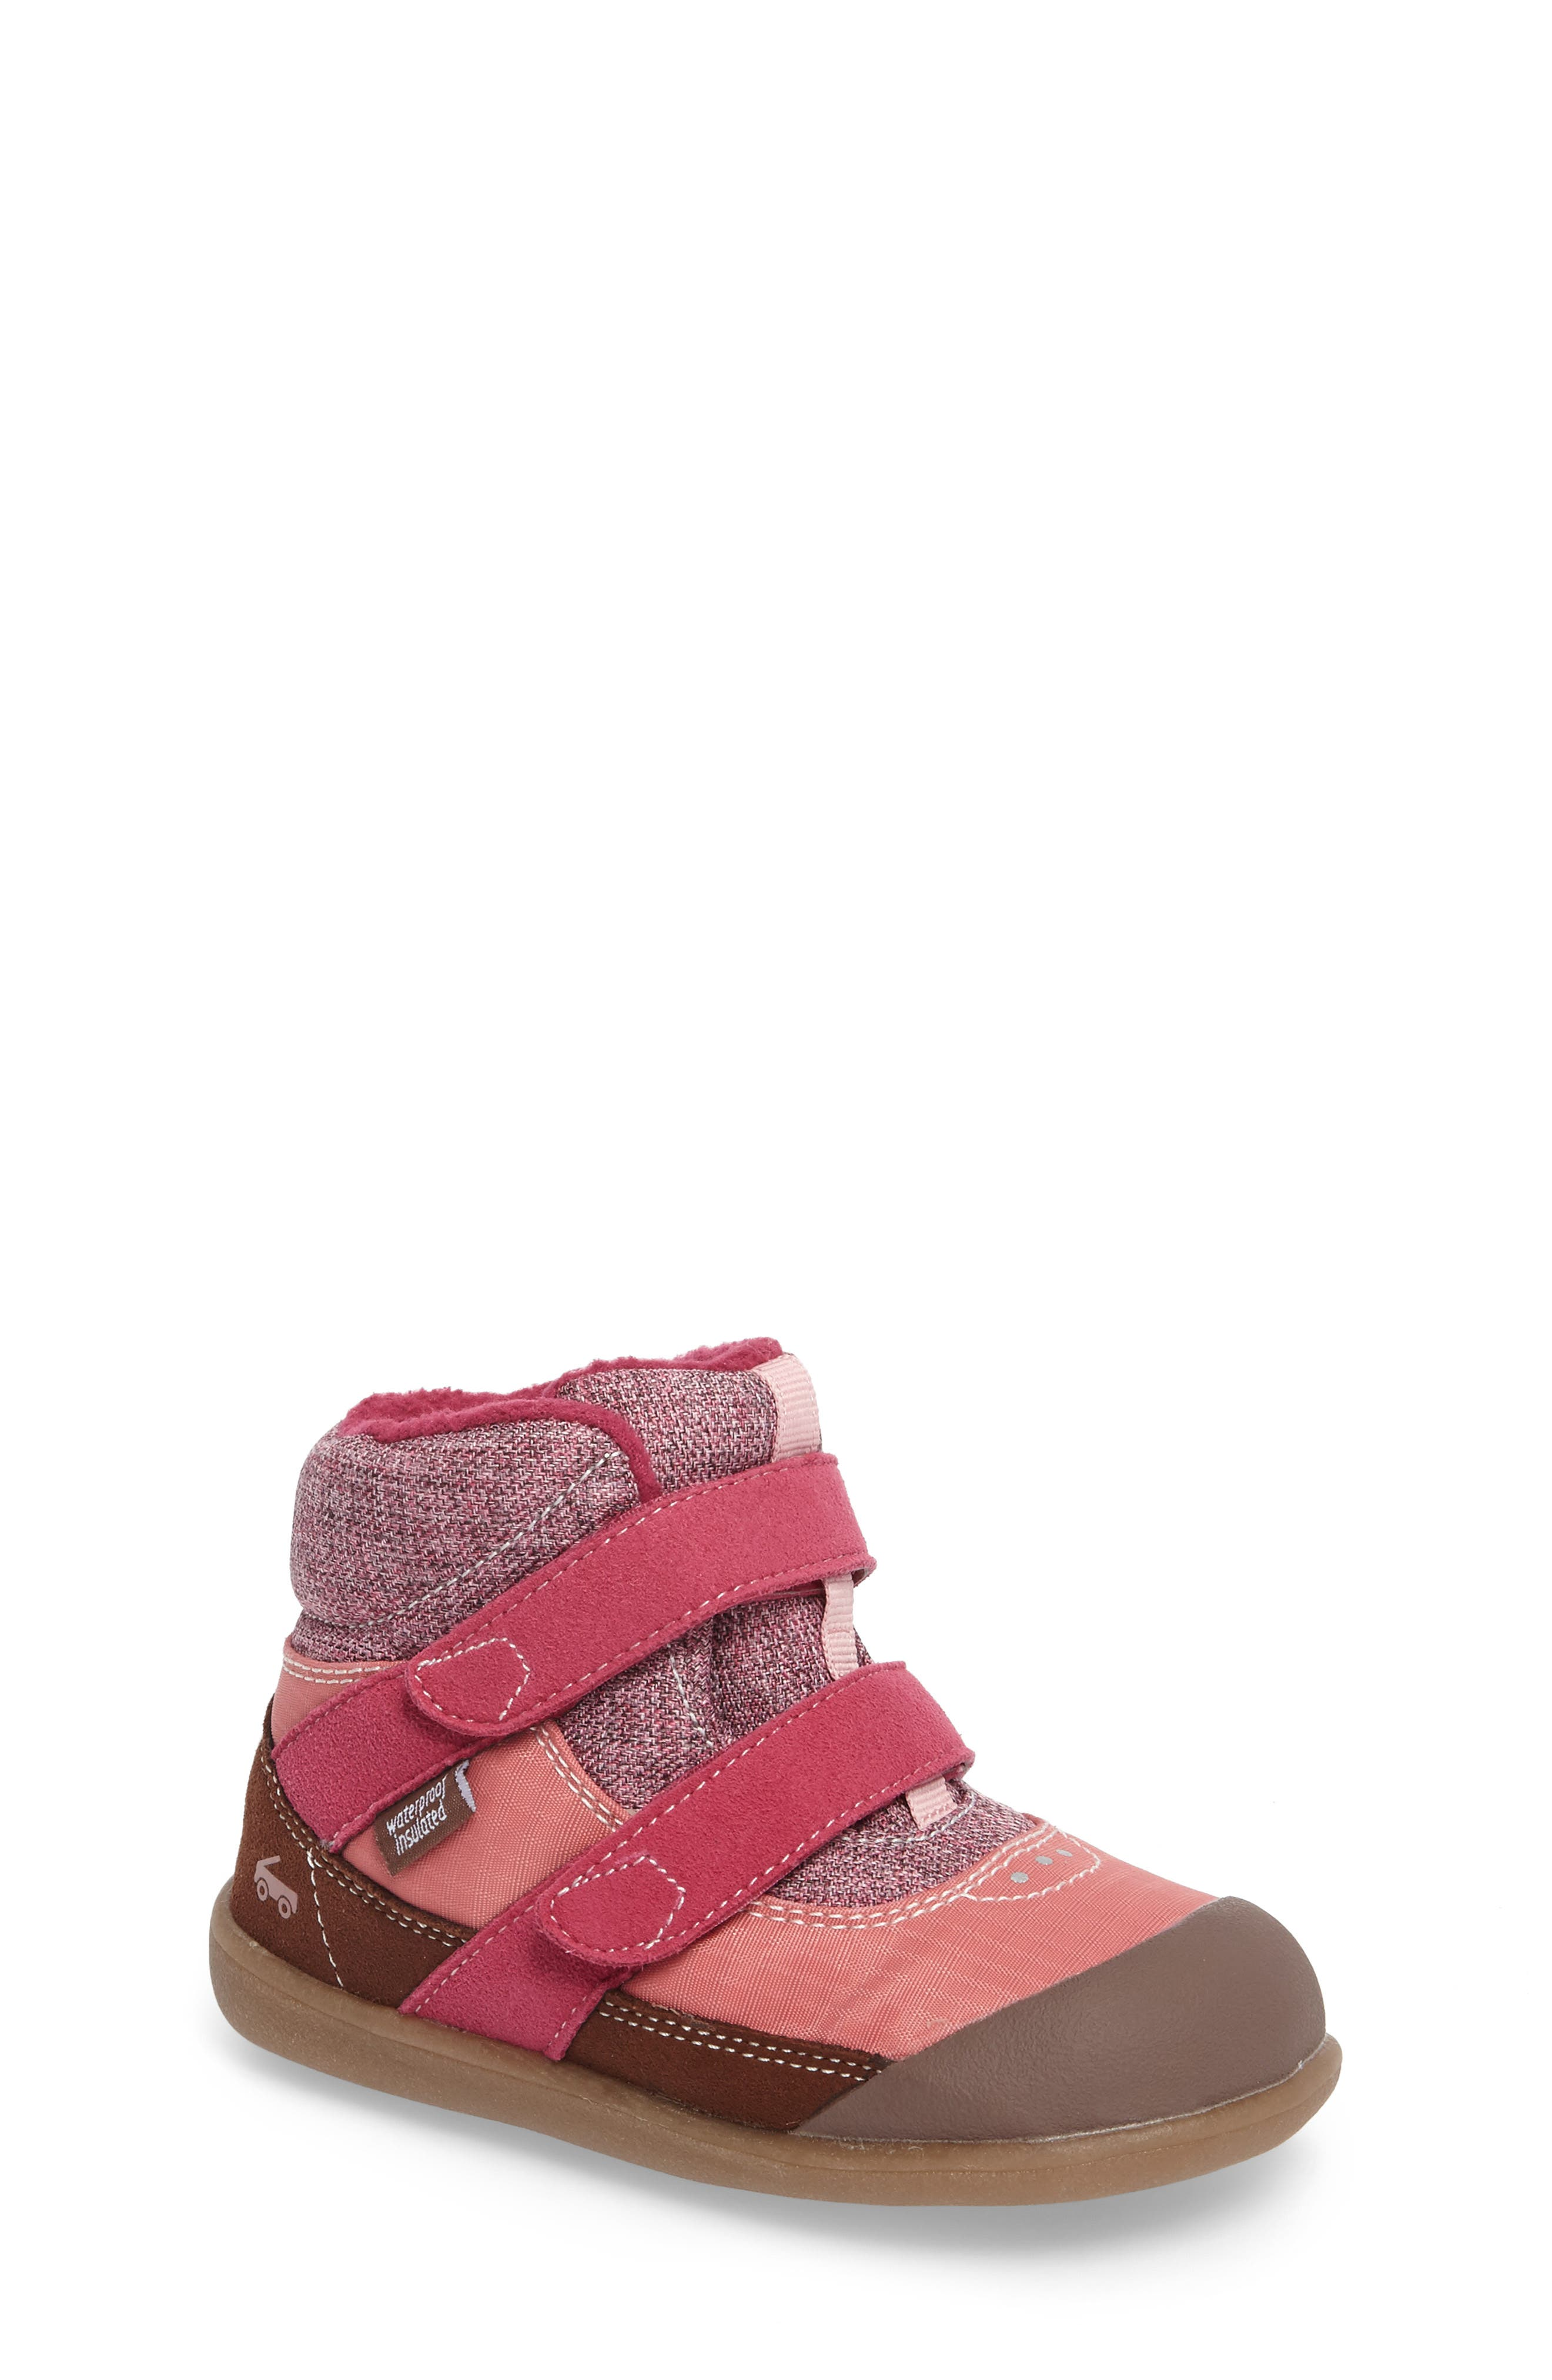 Atlas Waterproof Boot,                             Main thumbnail 1, color,                             Pink